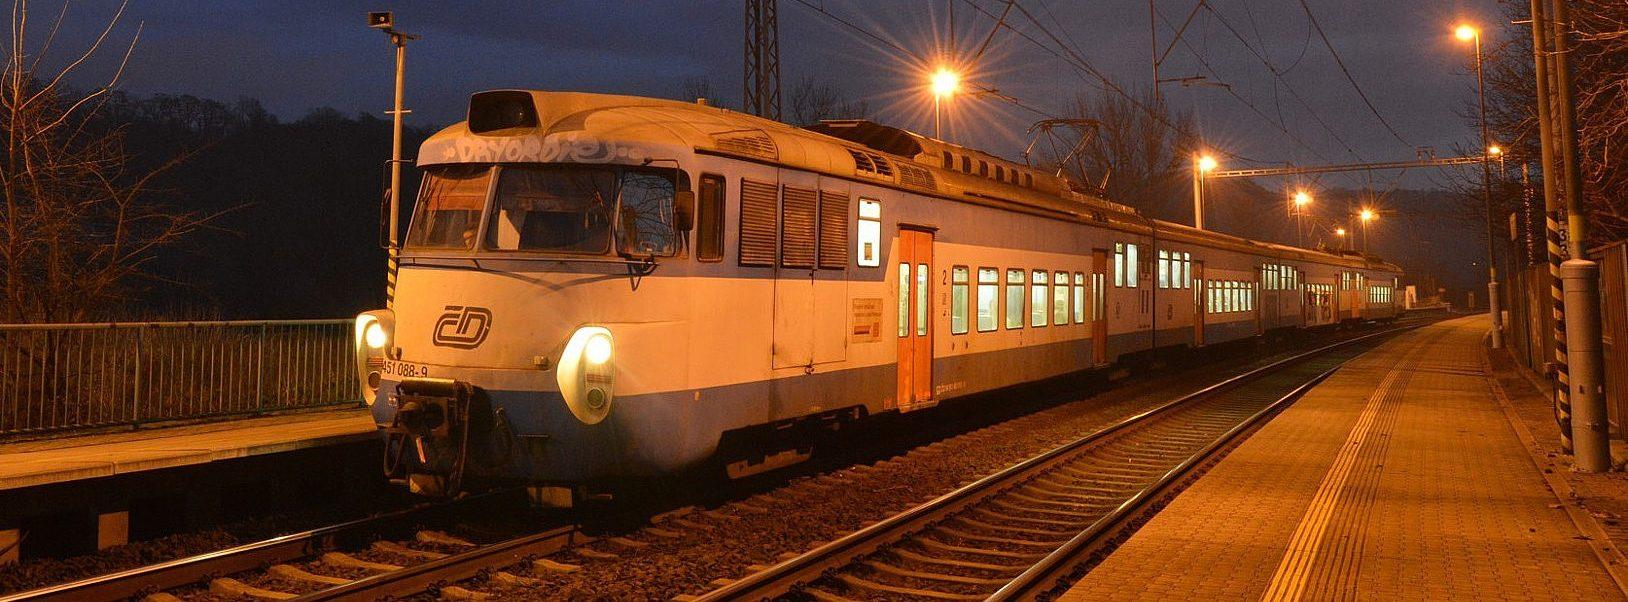 TRAM-BUS.cz